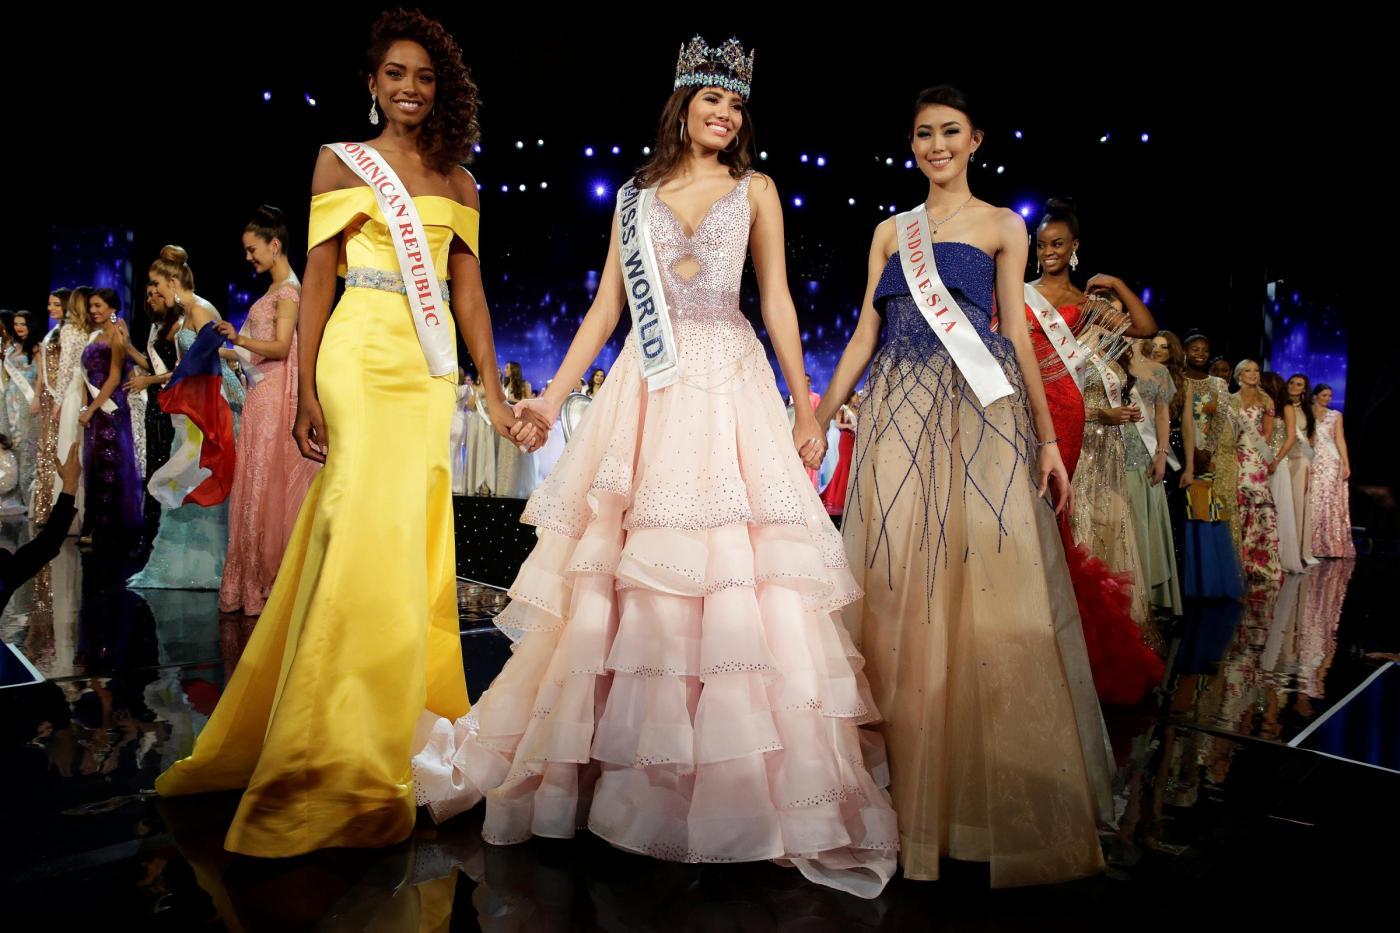 Miss mondo 2016 è la miss Puerto Rico